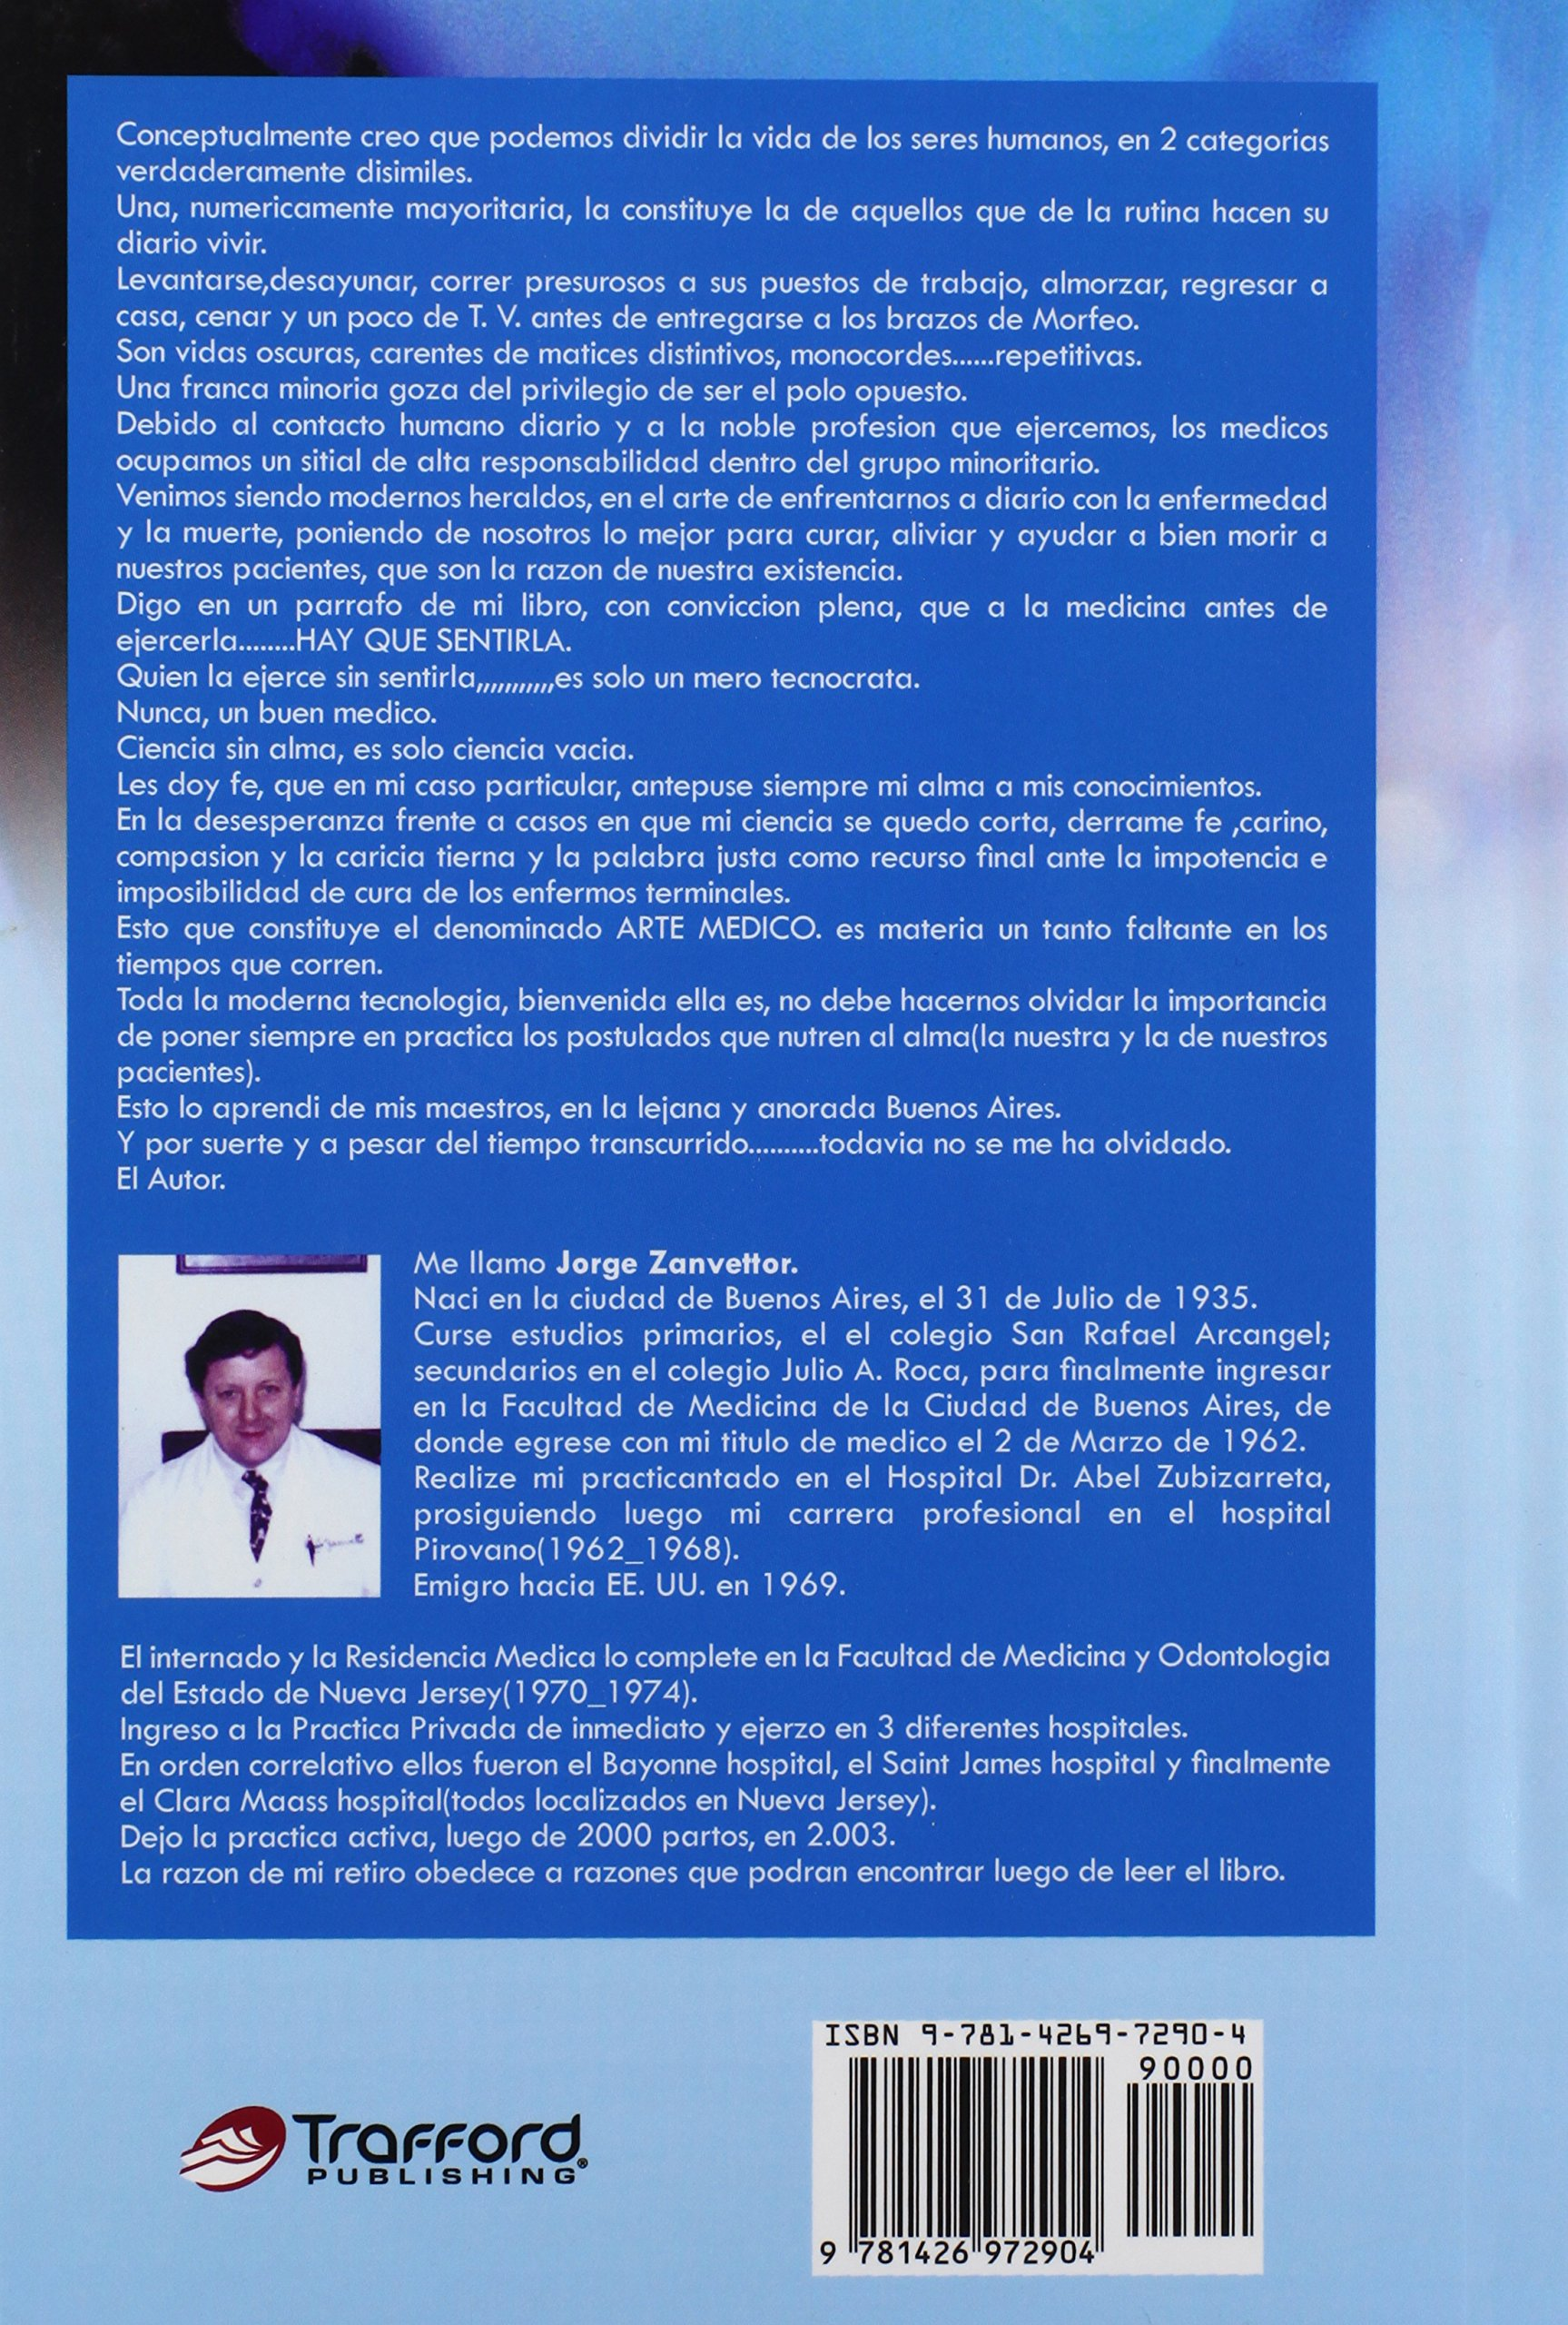 La Novela de Mi Vida: Buenos Aires-New Jersey (Spanish Edition): Jorge Zanvettor: 9781426972904: Amazon.com: Books